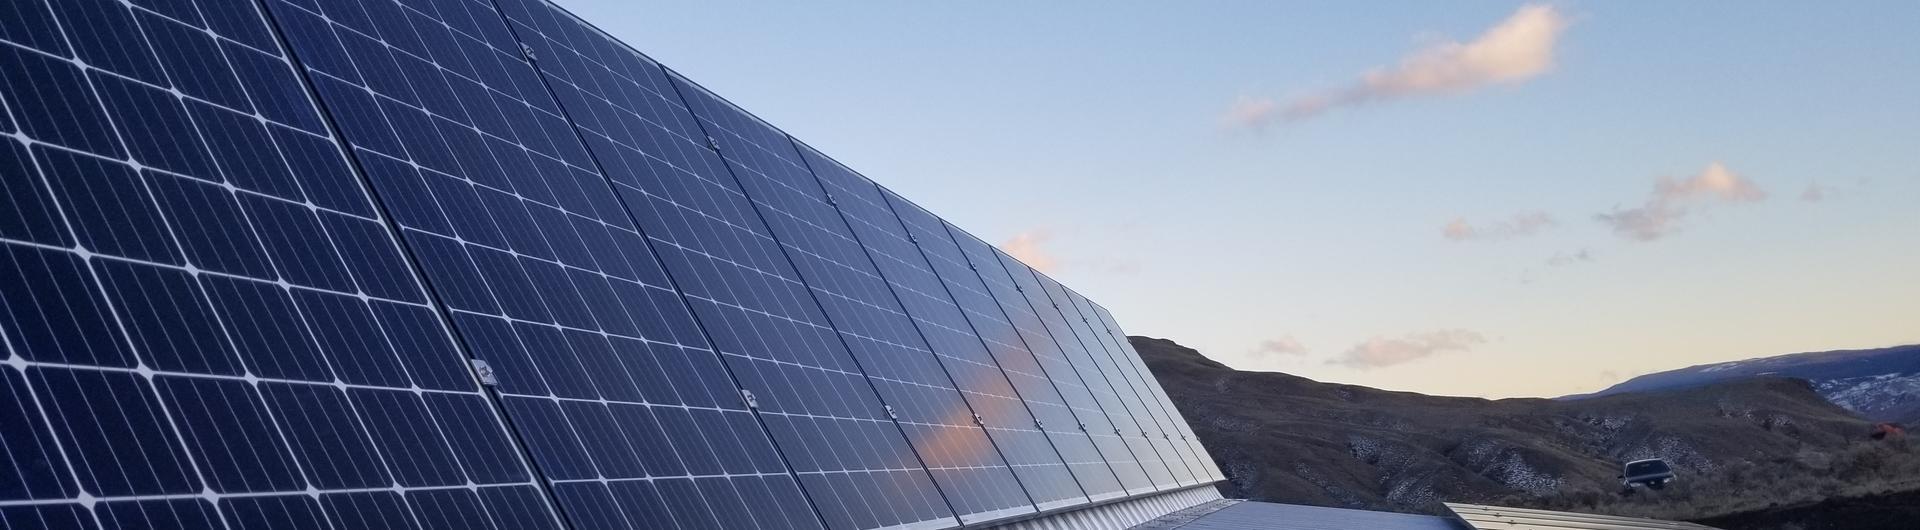 Off Grid Solar Energy Systems